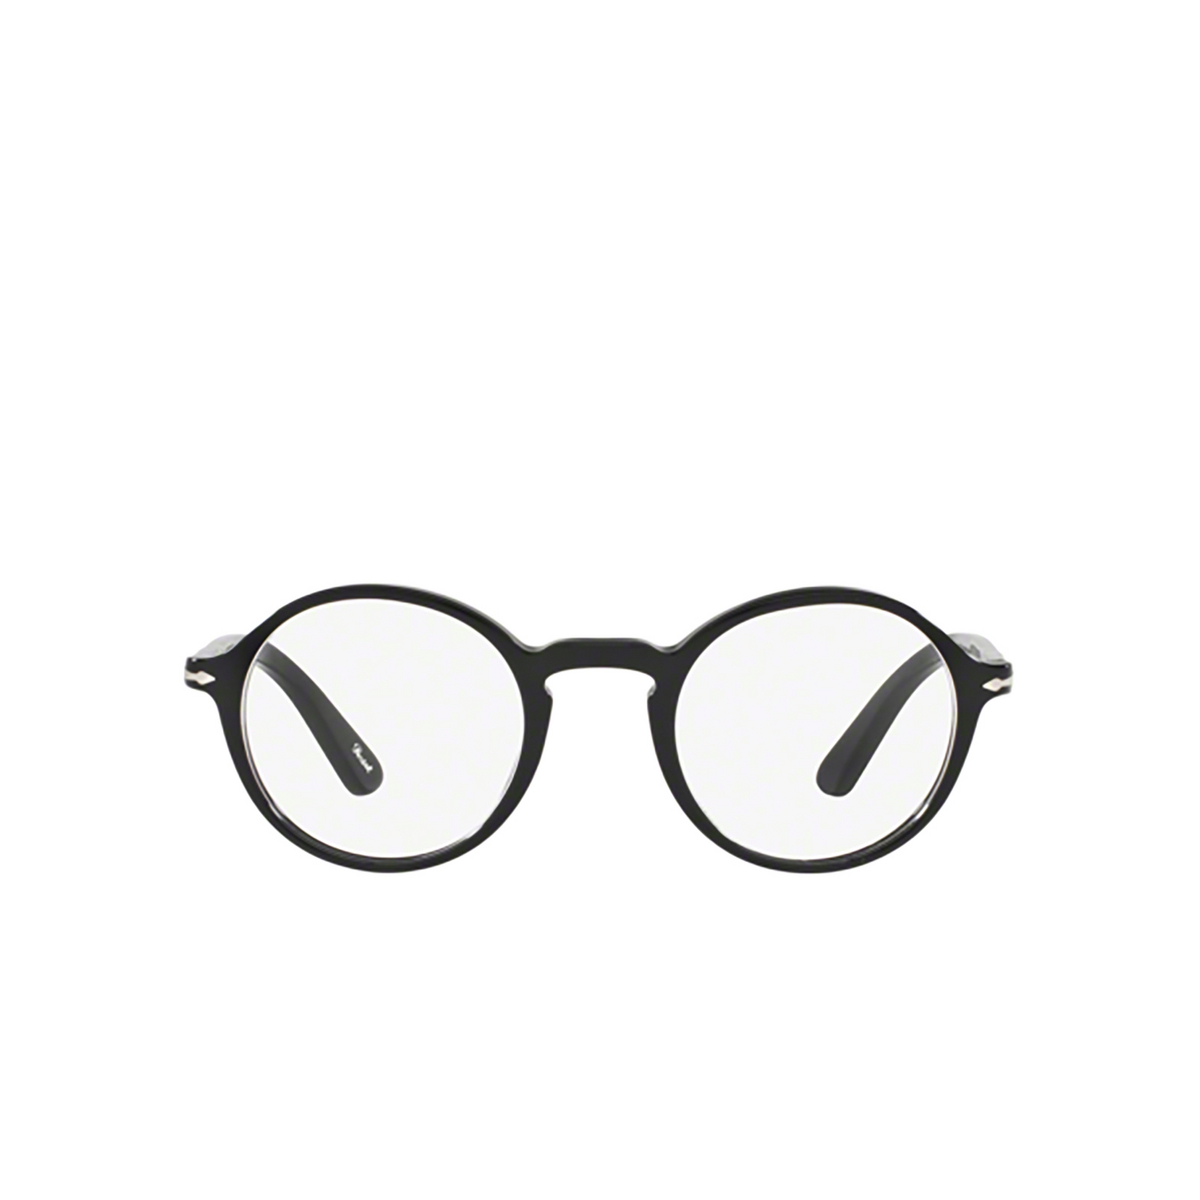 Persol® Round Eyeglasses: PO3141V color Black 95 - front view.